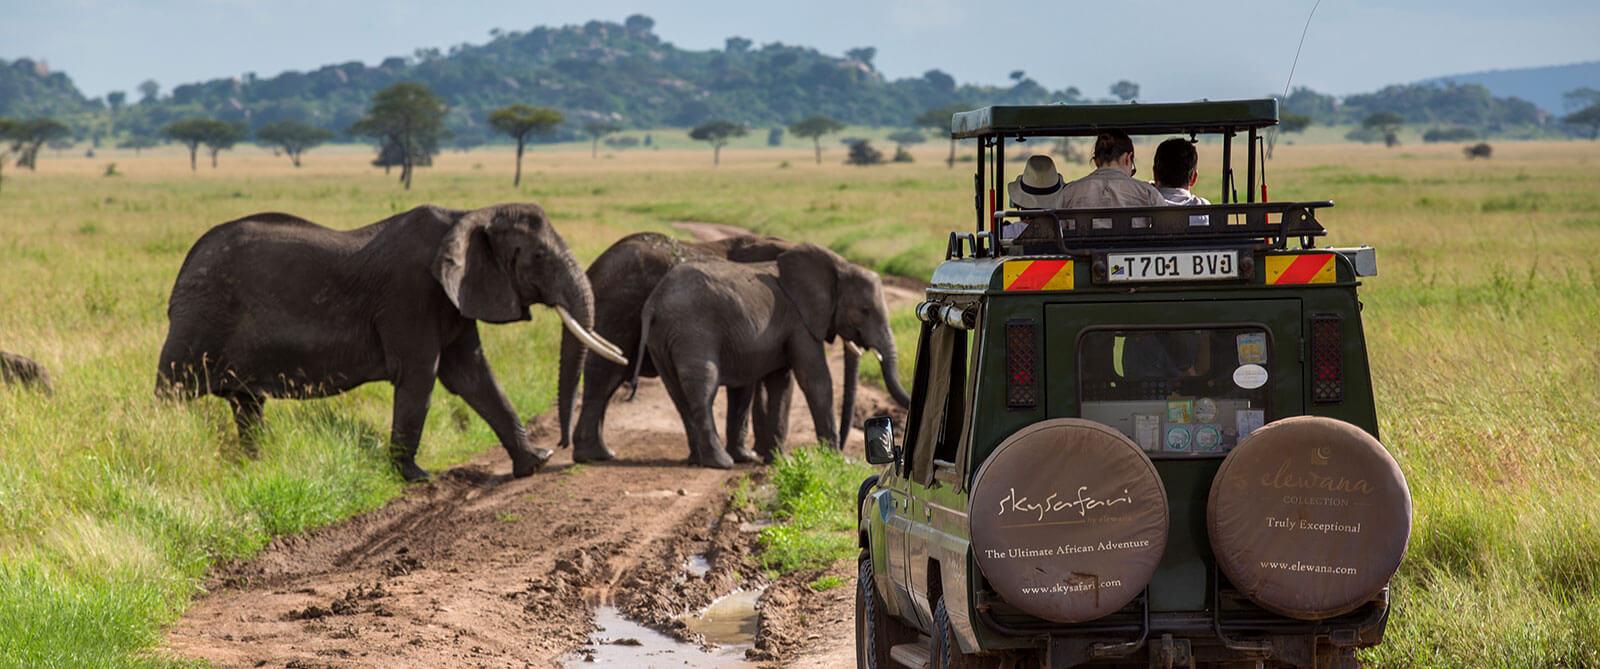 Serengeti Pioneer Camp - Elephants on Big 5 Game Drive - Tanzania Safari Honeymoon